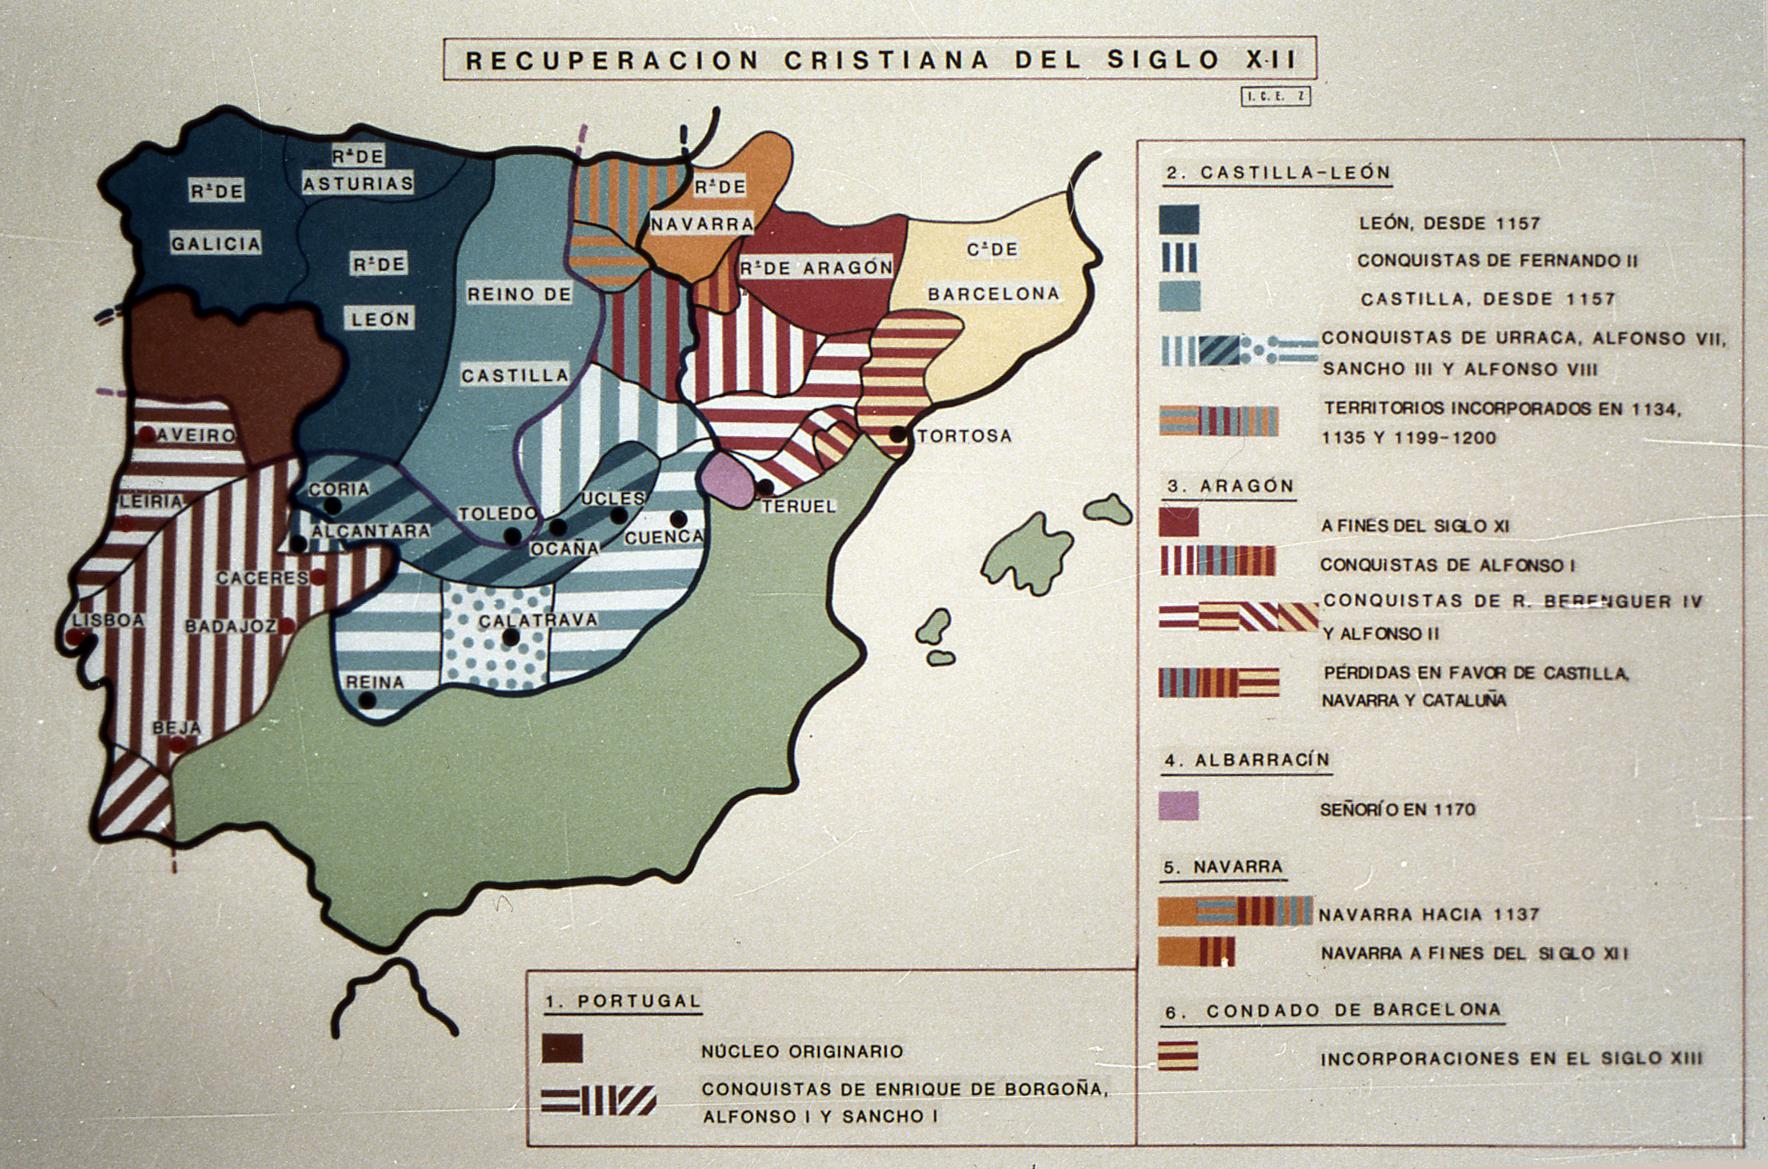 mapa de la peninsula iberica reconquistada